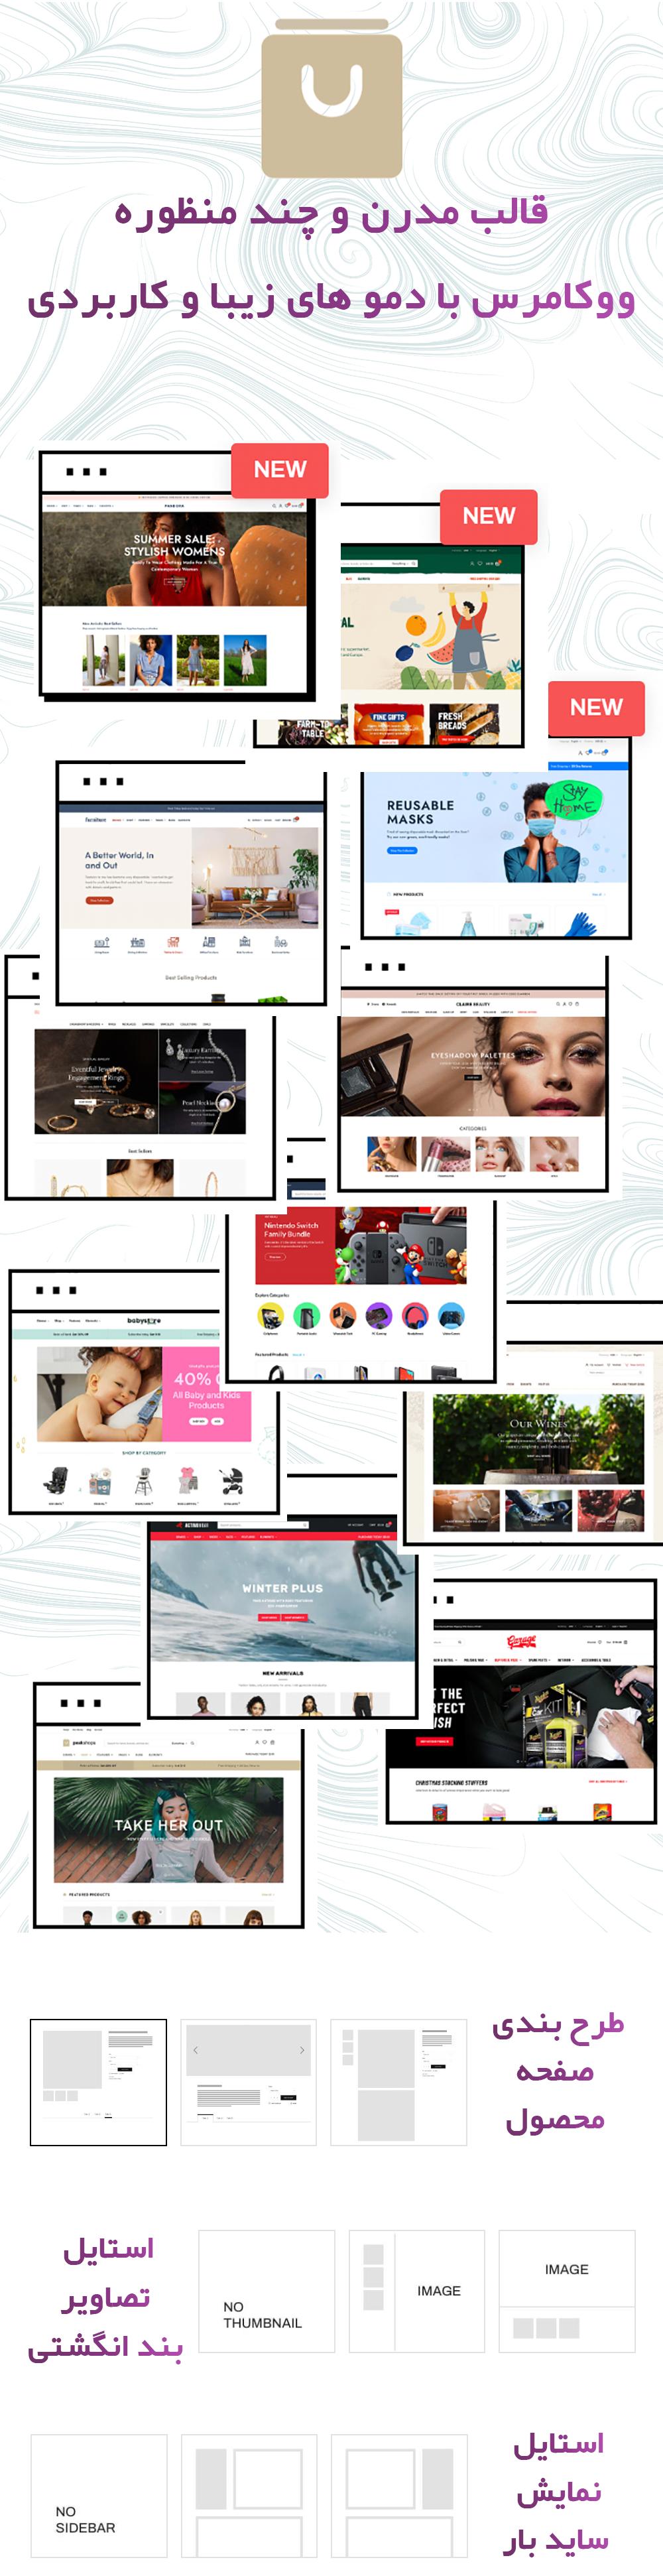 قالب PeakShops - قالب فروشگاهی پیک شاپ